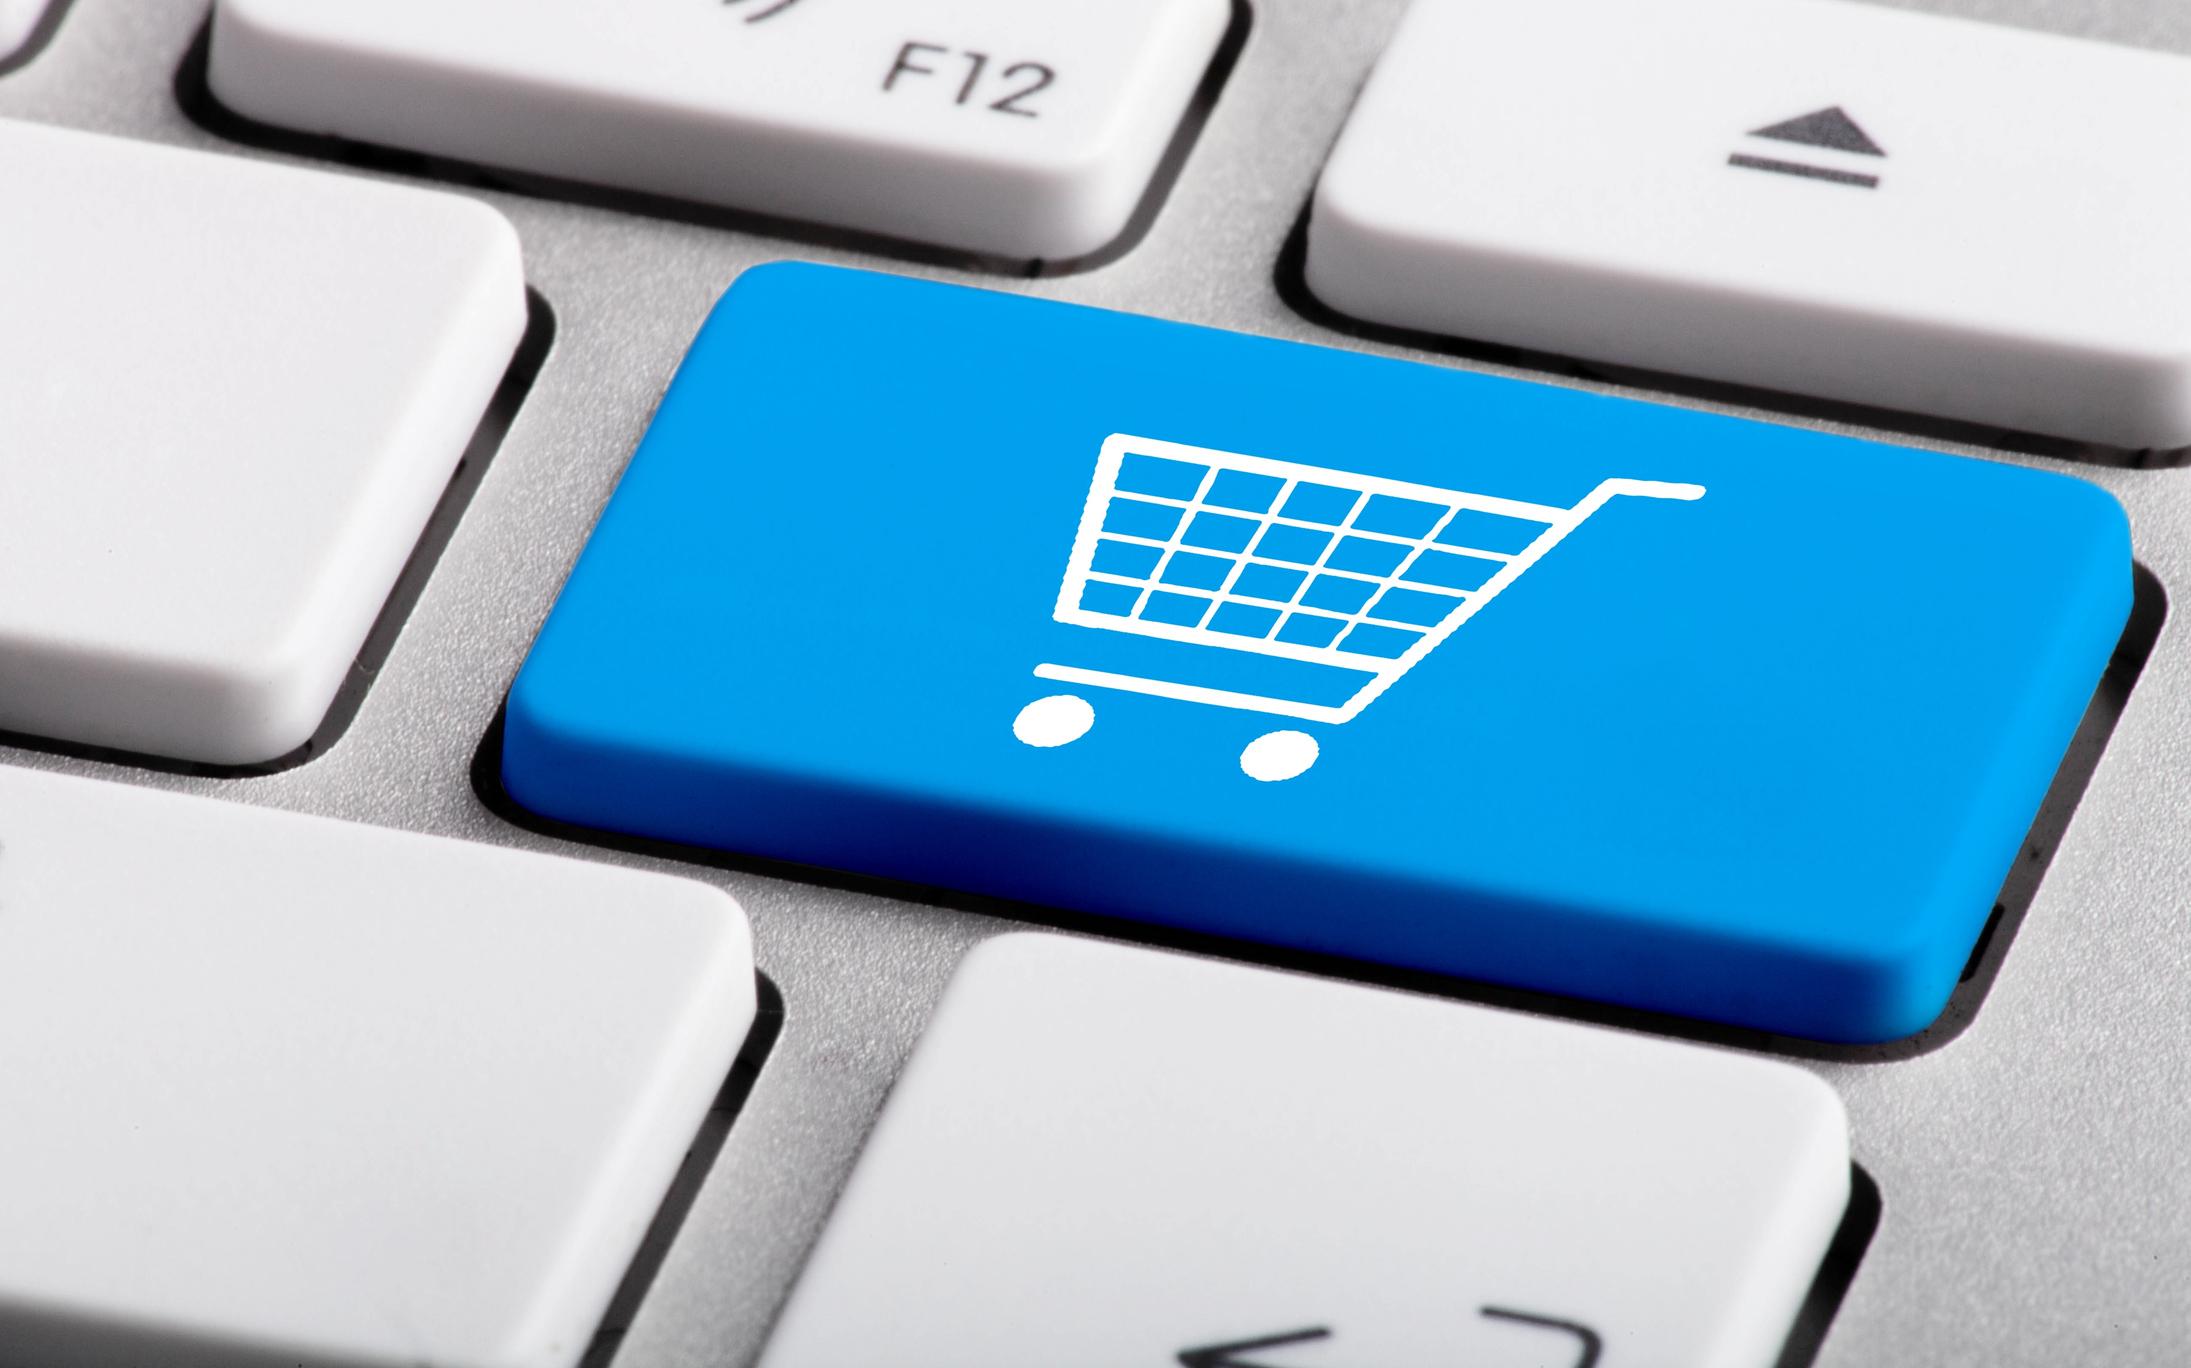 A shopping cart image on a keyboard key.